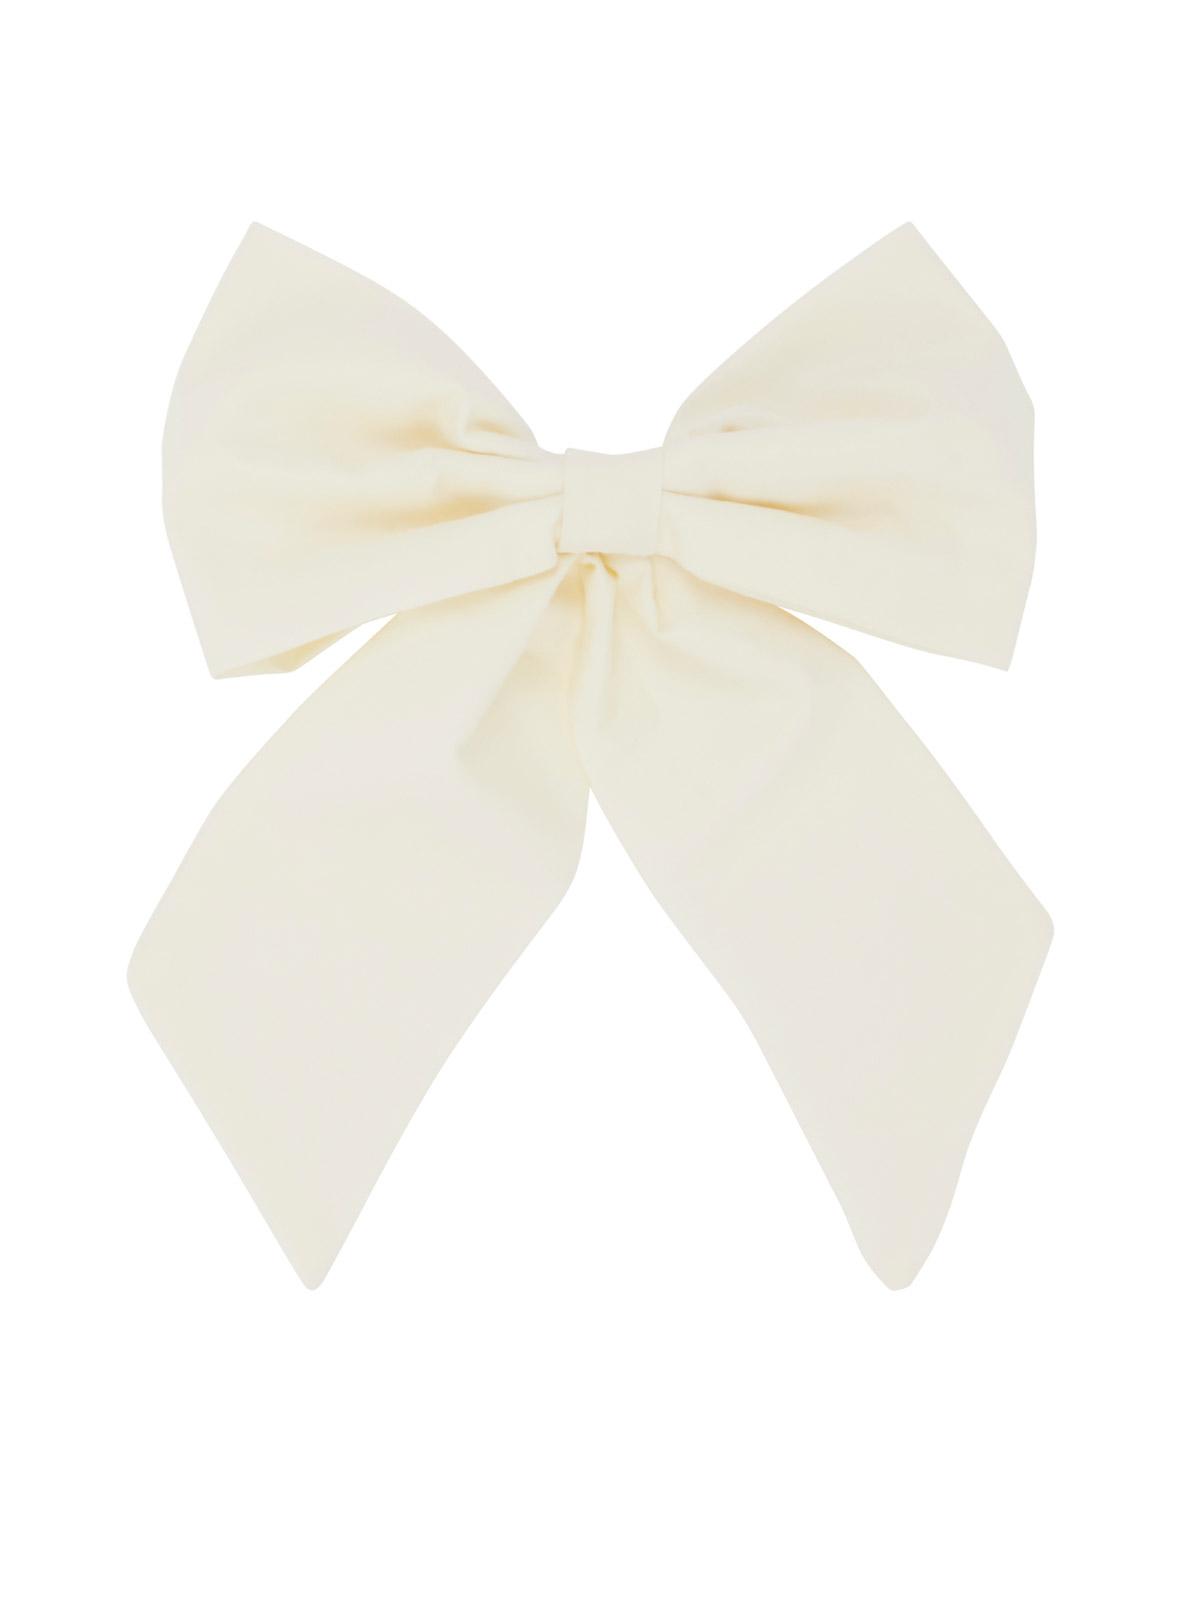 Cafe Society Large Bow Hair Clips Cream